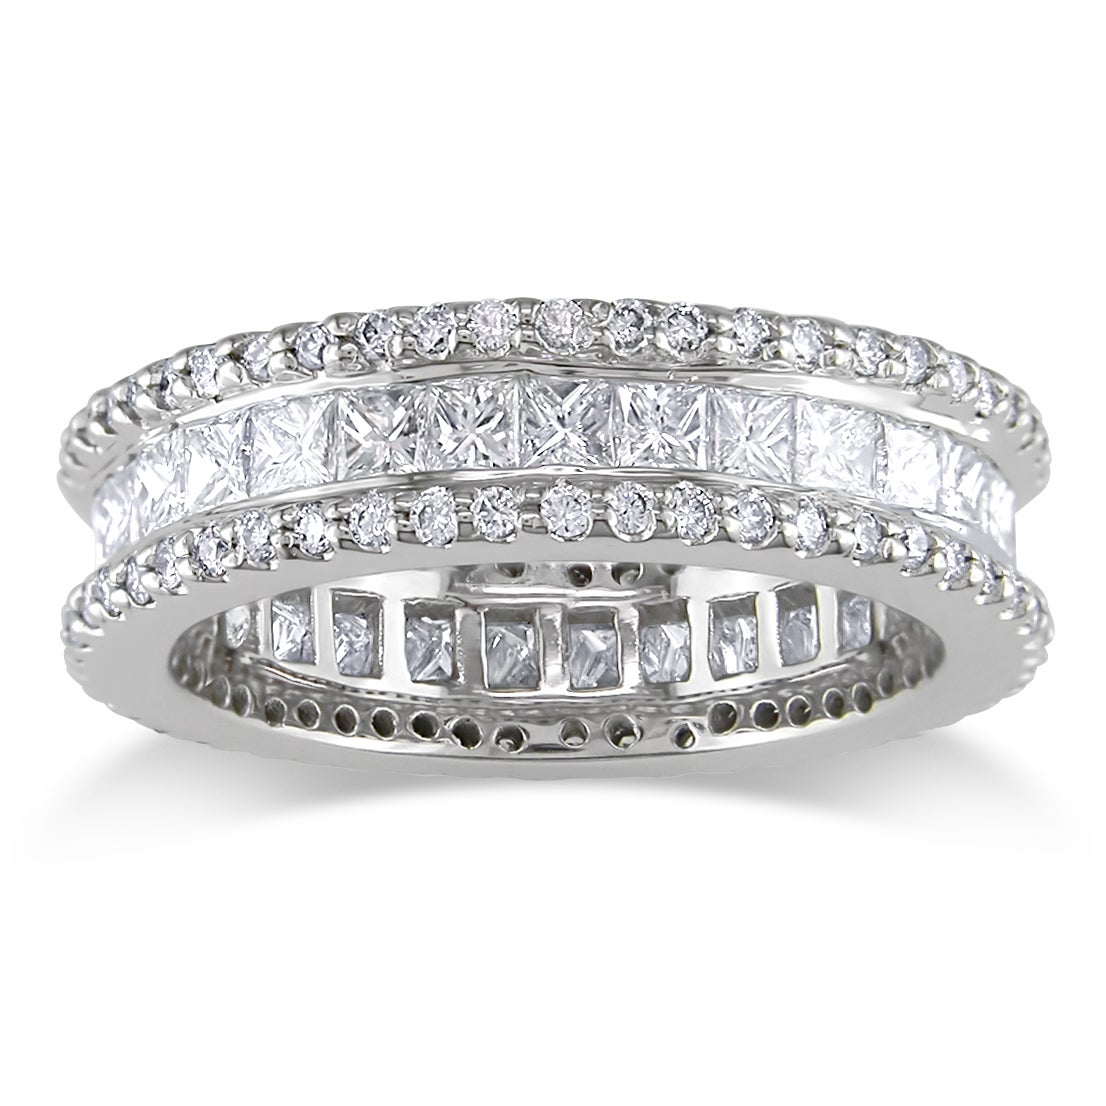 Miadora 18k White Gold 2-3/8ct TDW Diamond Eternity Ring (G-H) (VS1-VS2) (Size 8)